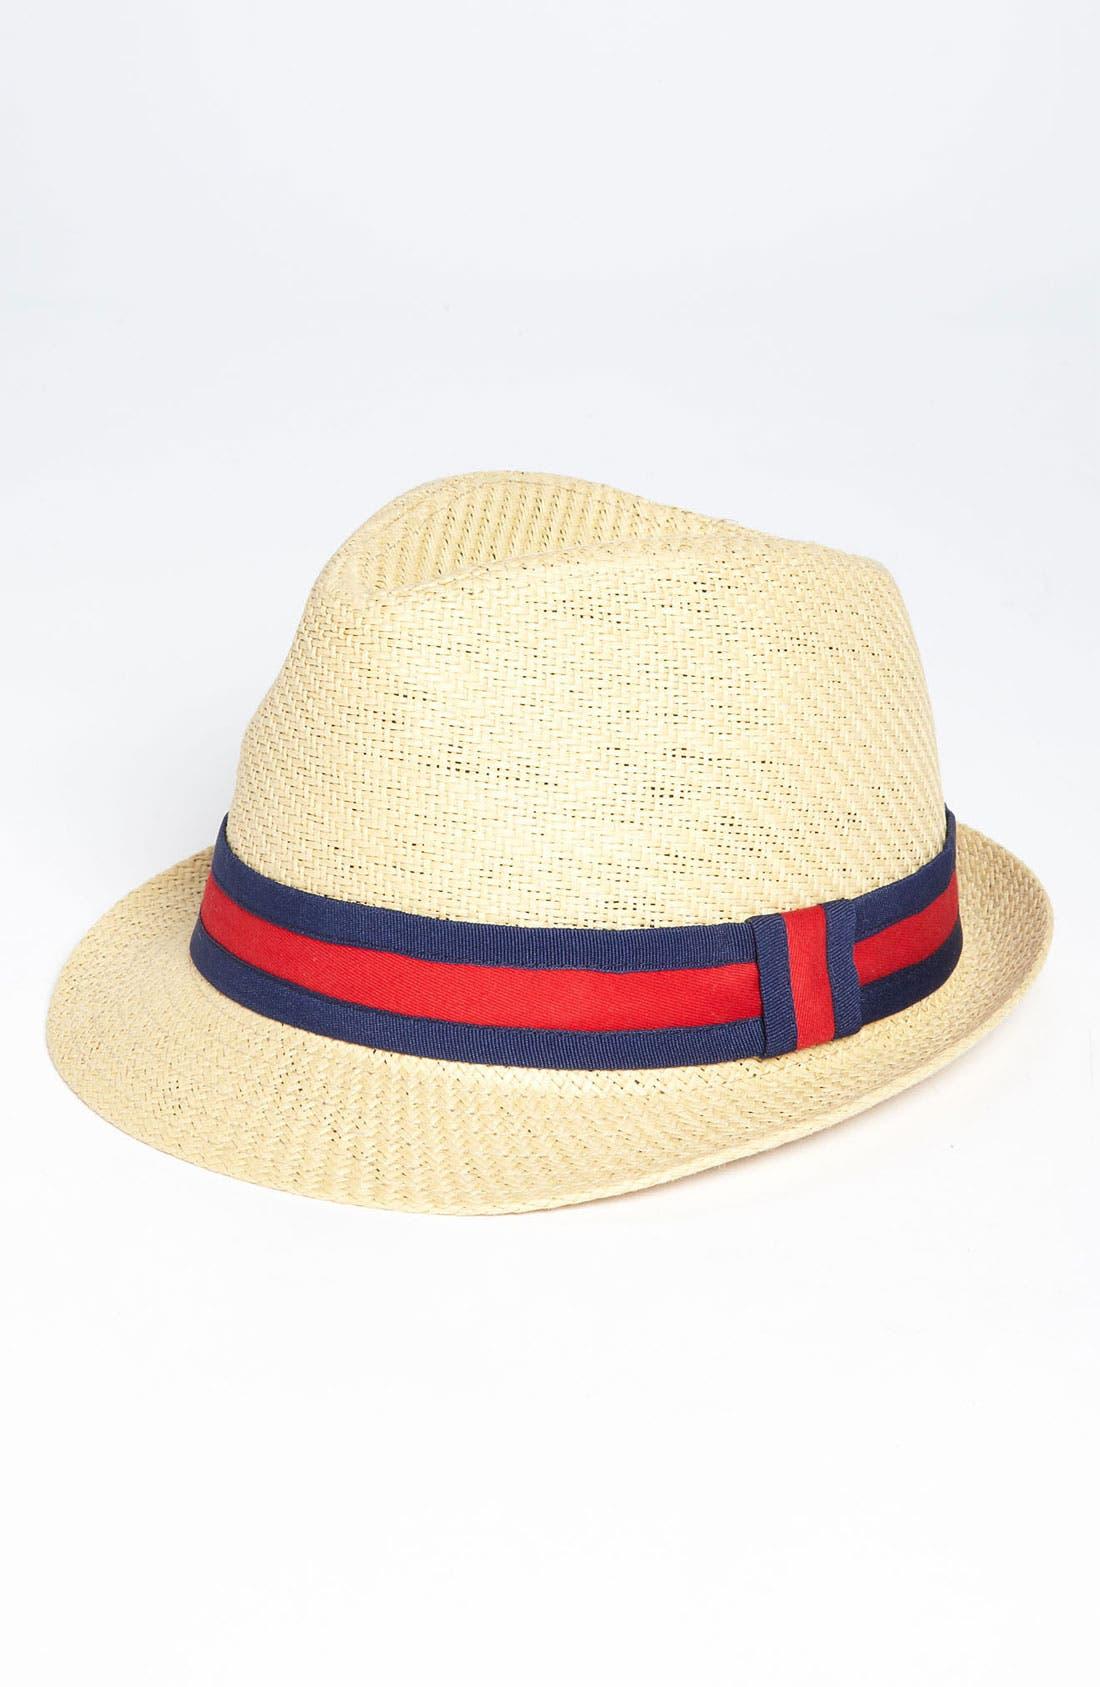 Alternate Image 1 Selected - Glory Hats by Goorin 'Jackson' Fedora